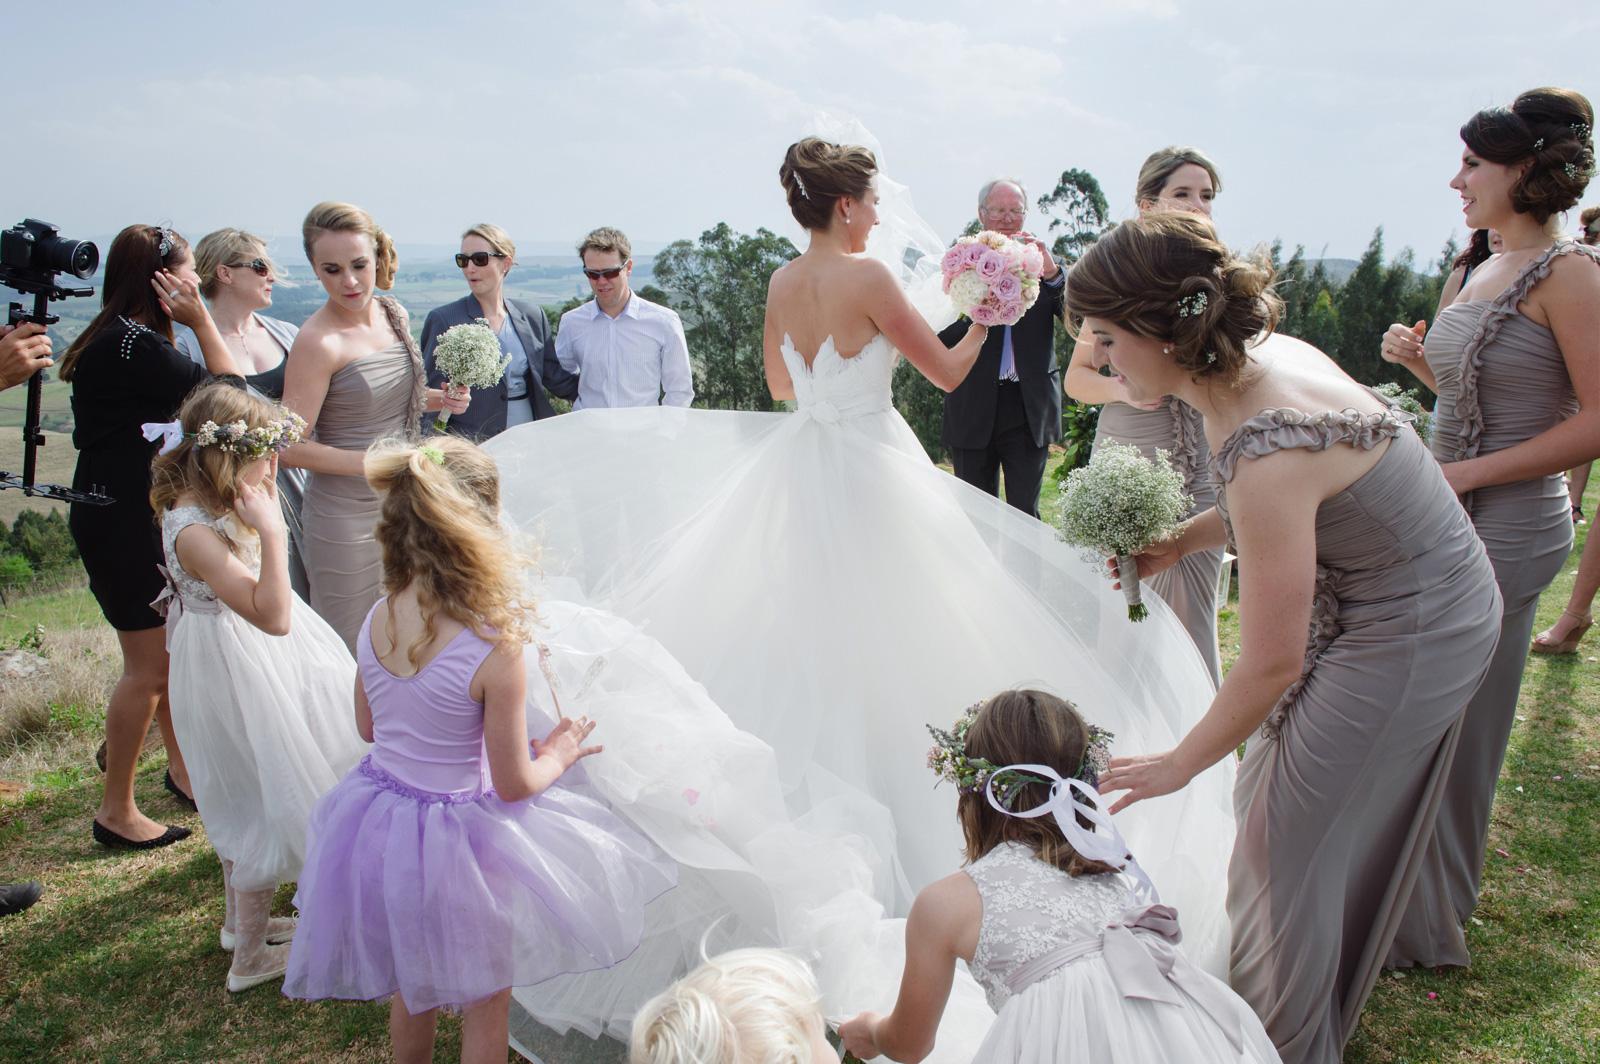 girls fixing wedding dress